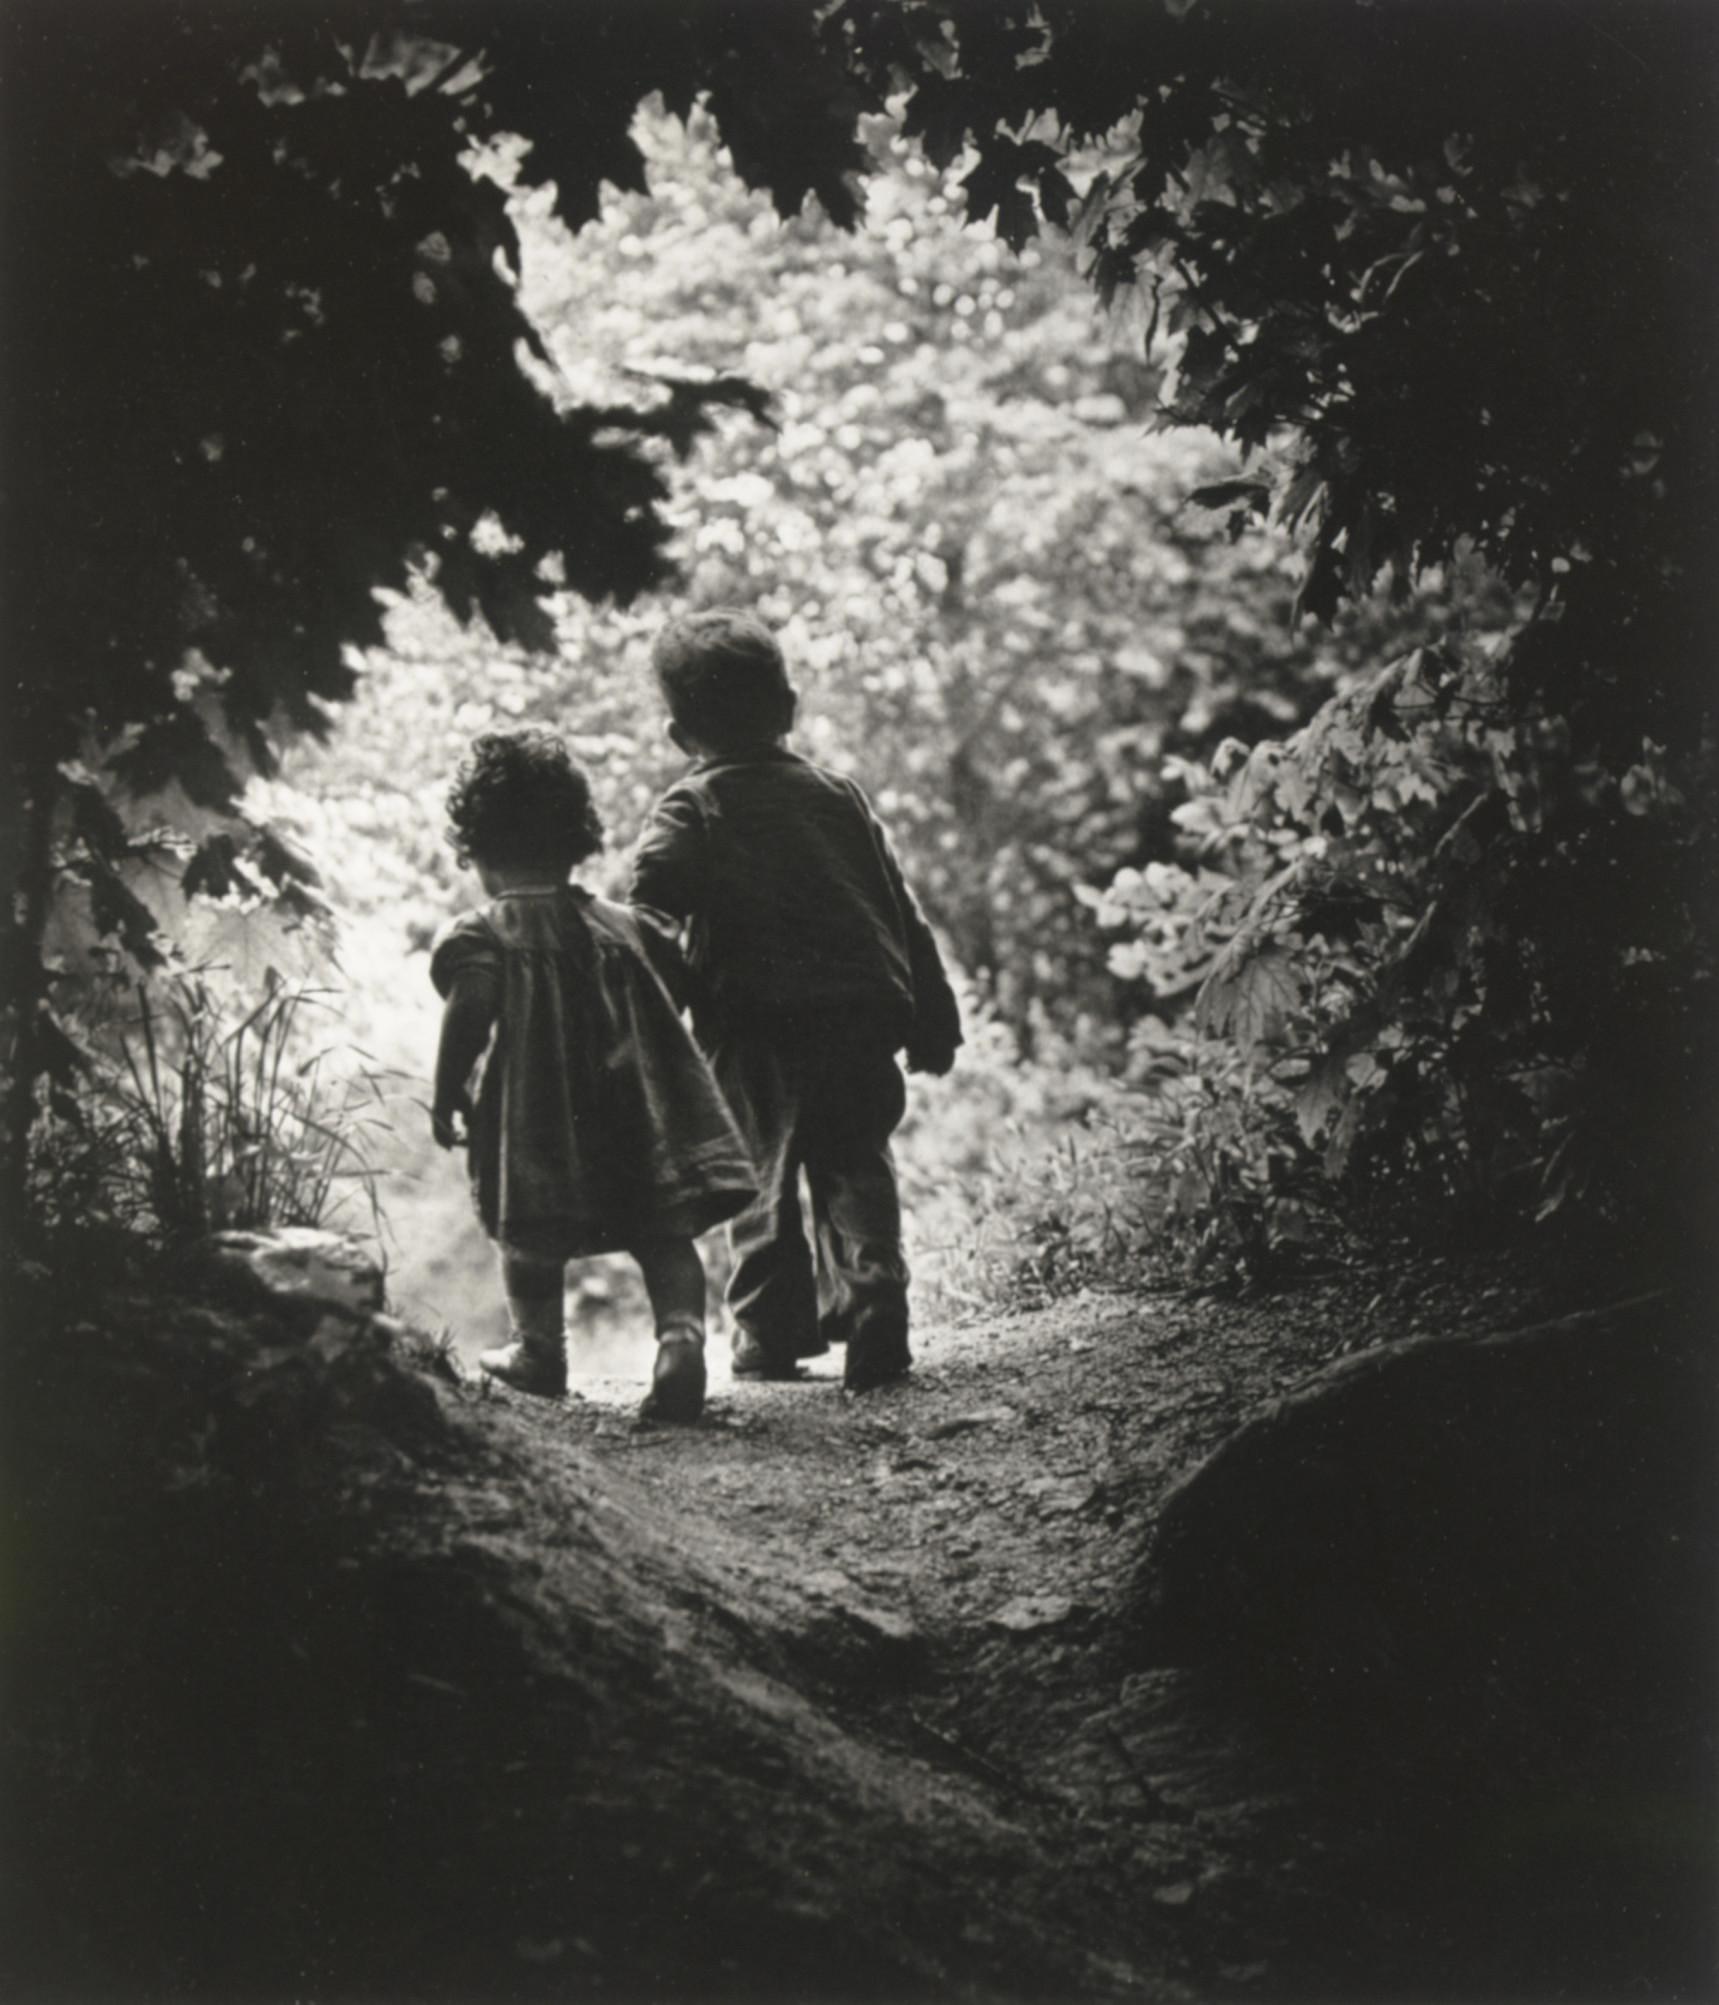 W. EUGENE SMITH (1918-1978)